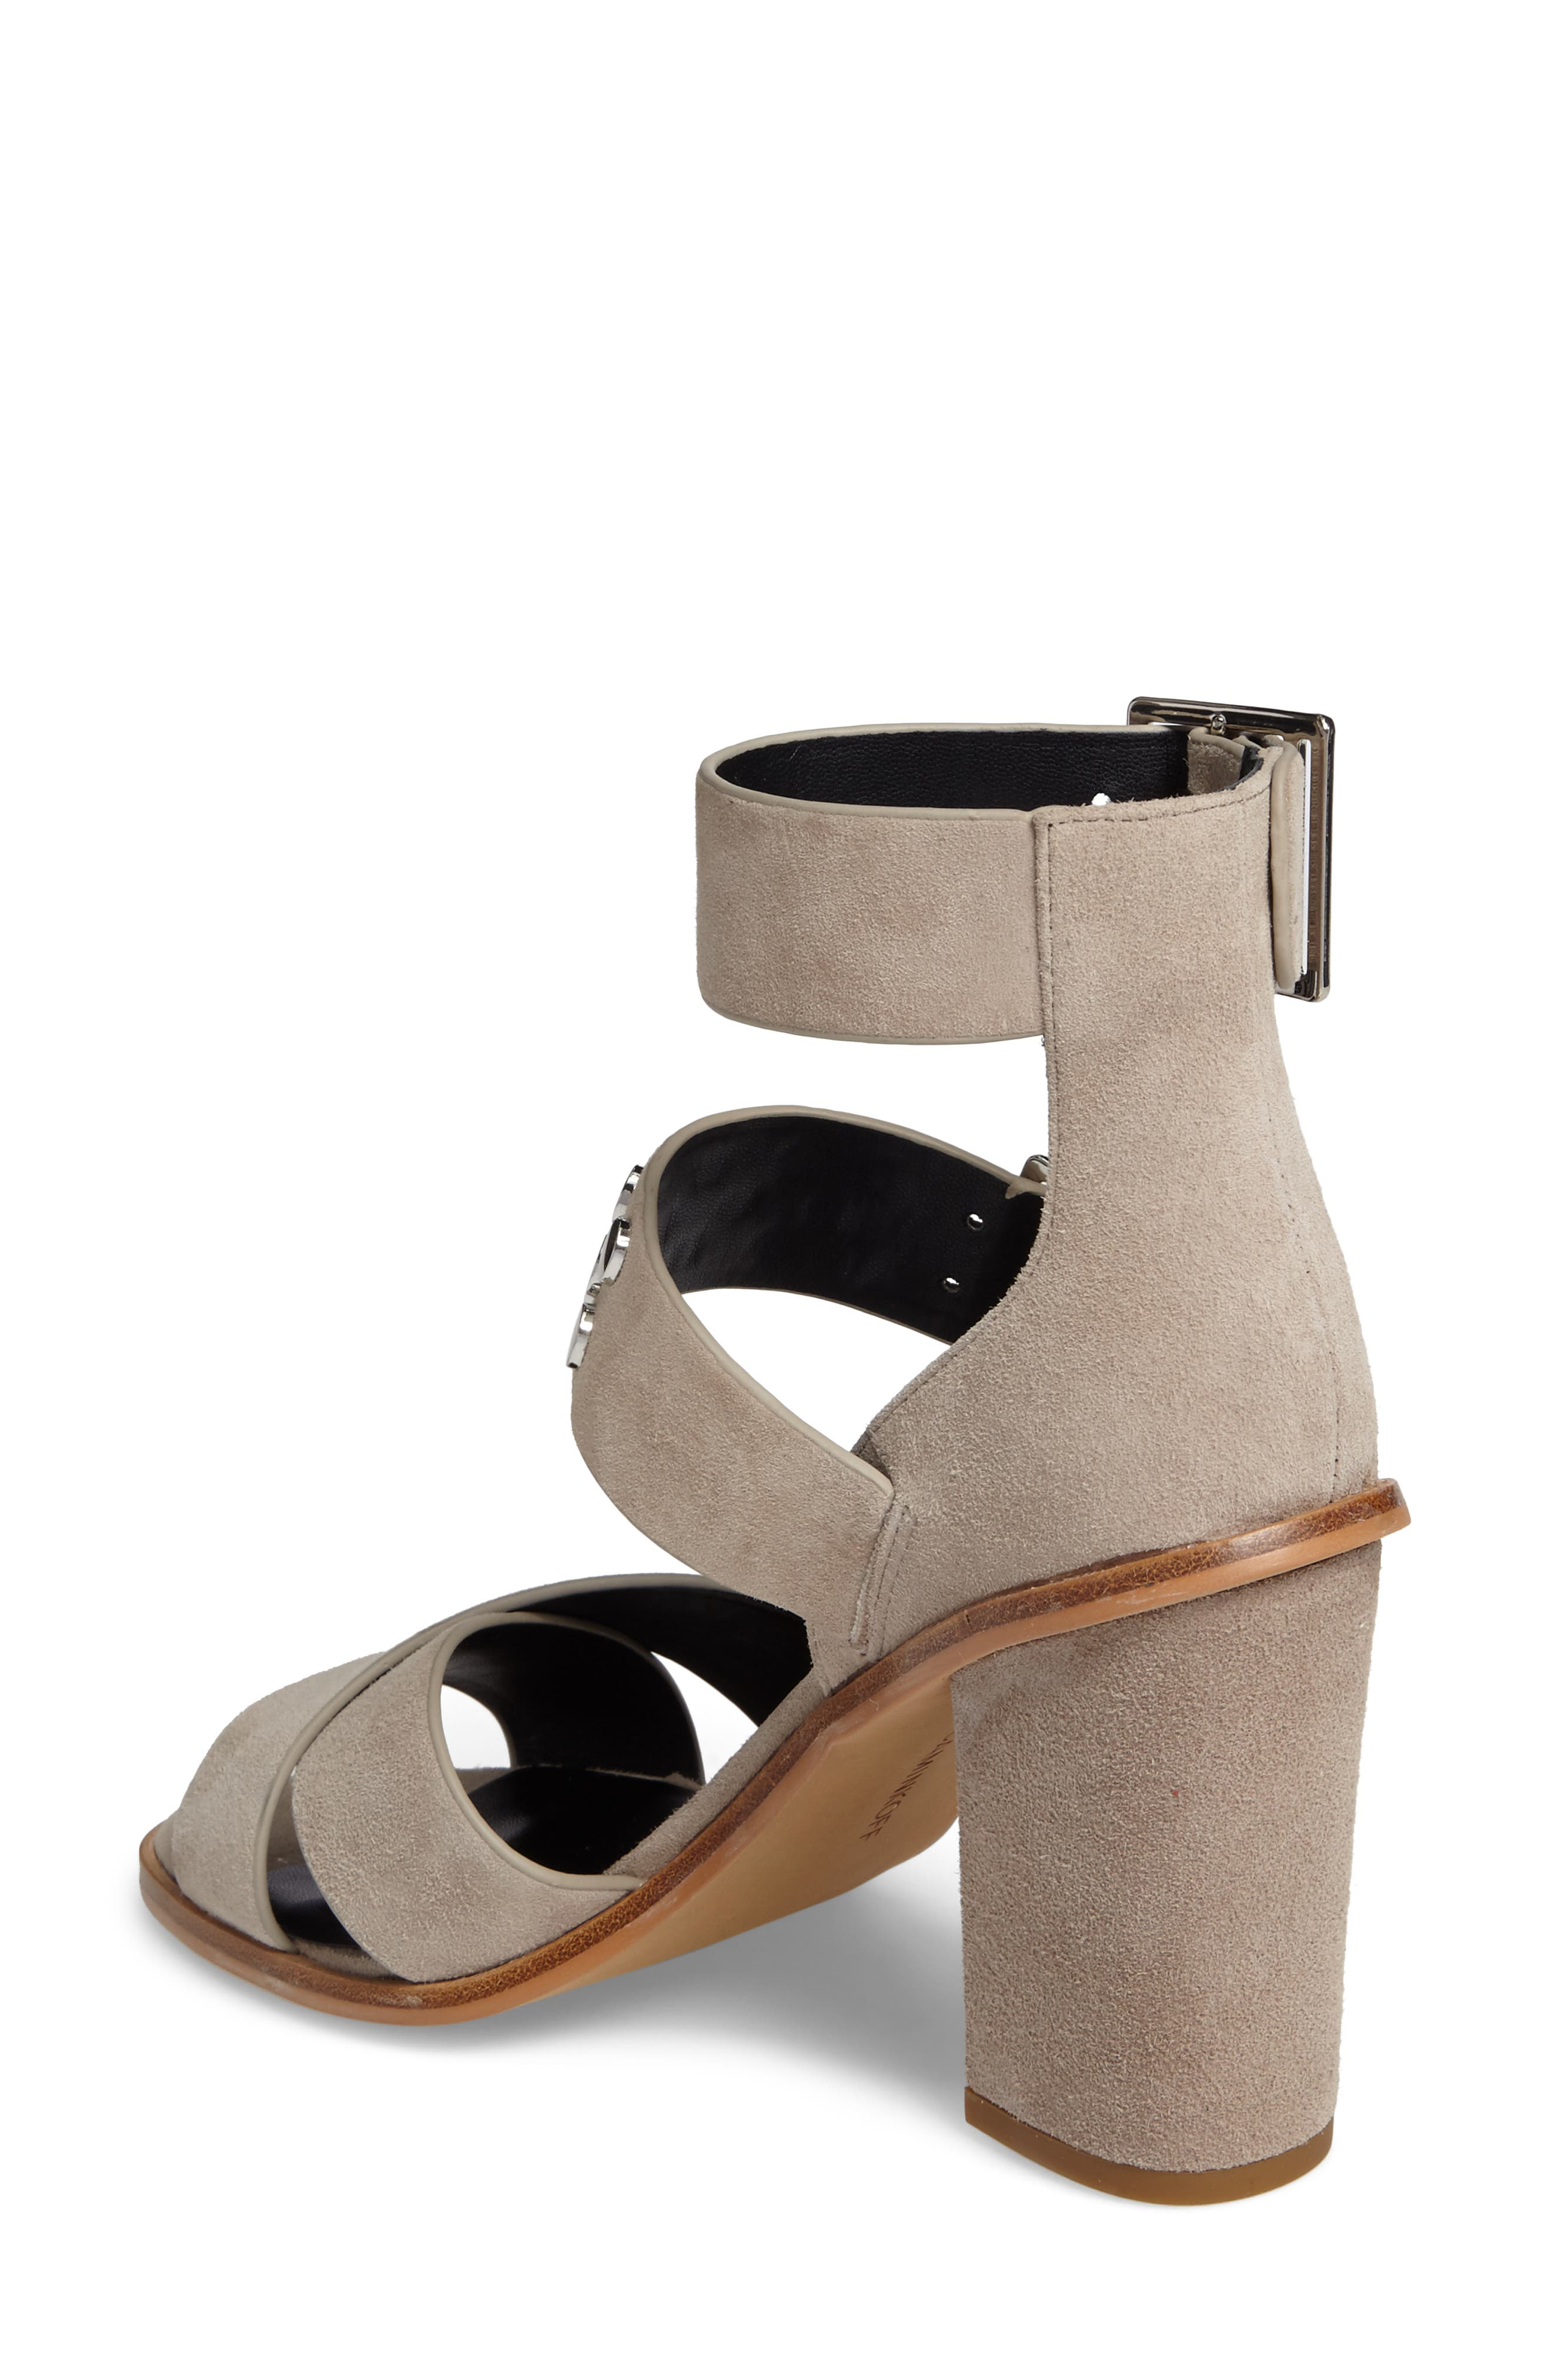 Jennifer Studded Ankle Cuff Sandal,                             Alternate thumbnail 5, color,